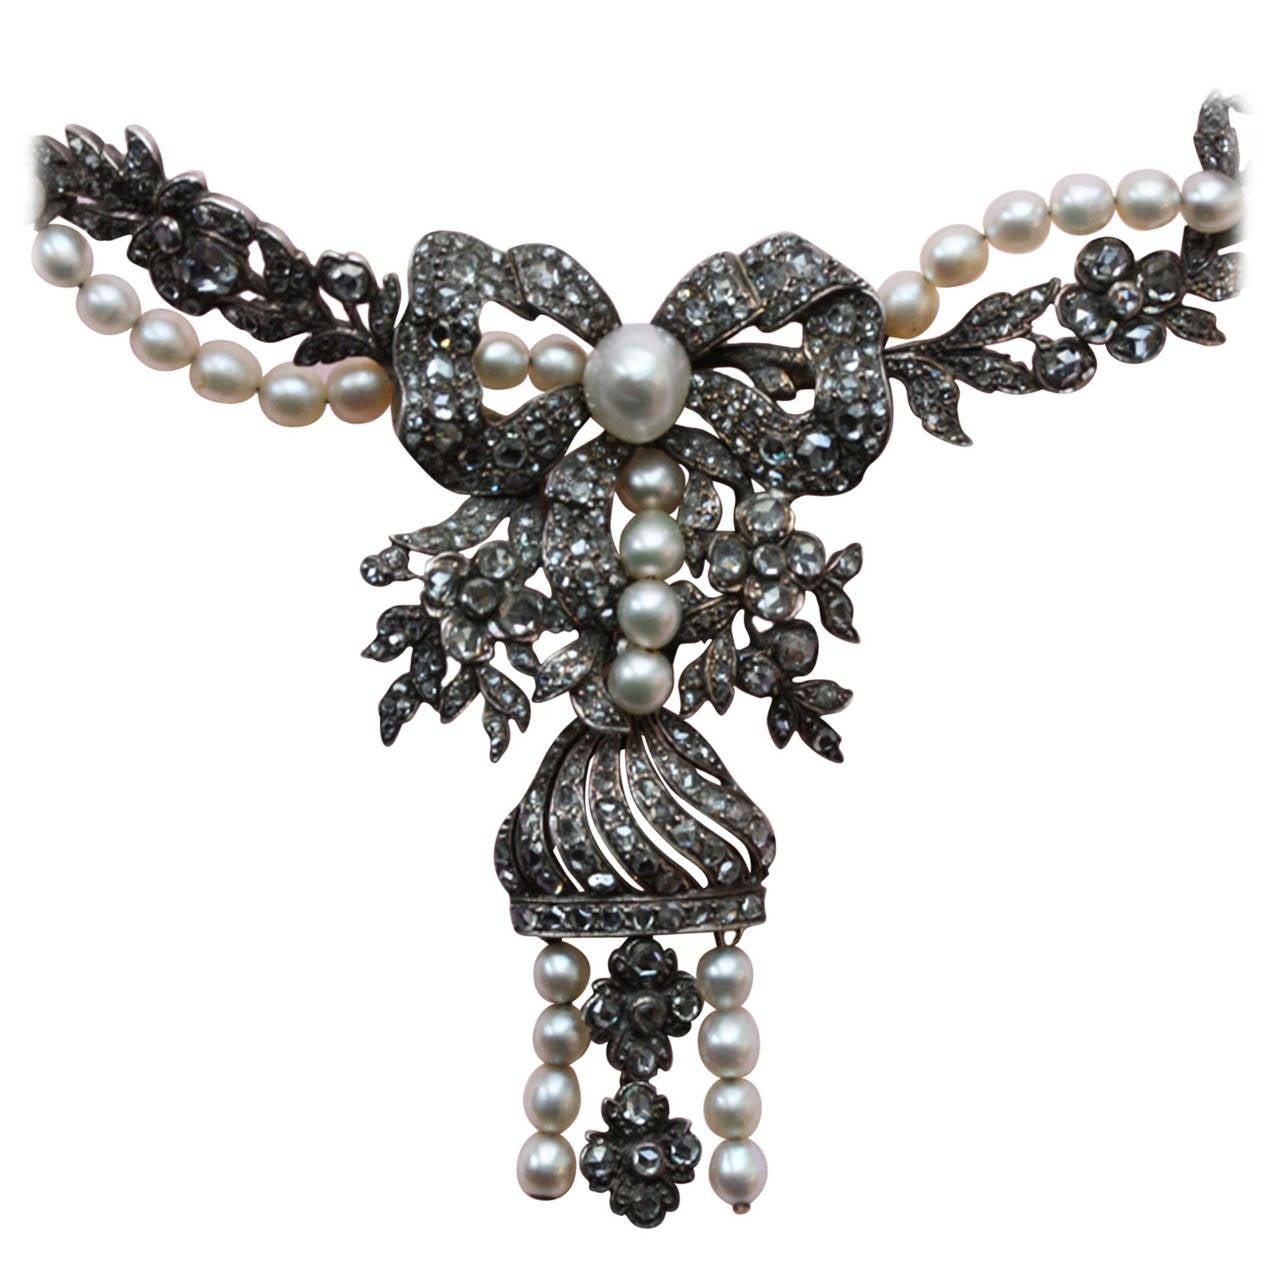 Pearl Rose Cut Diamond Flower Garland Necklace